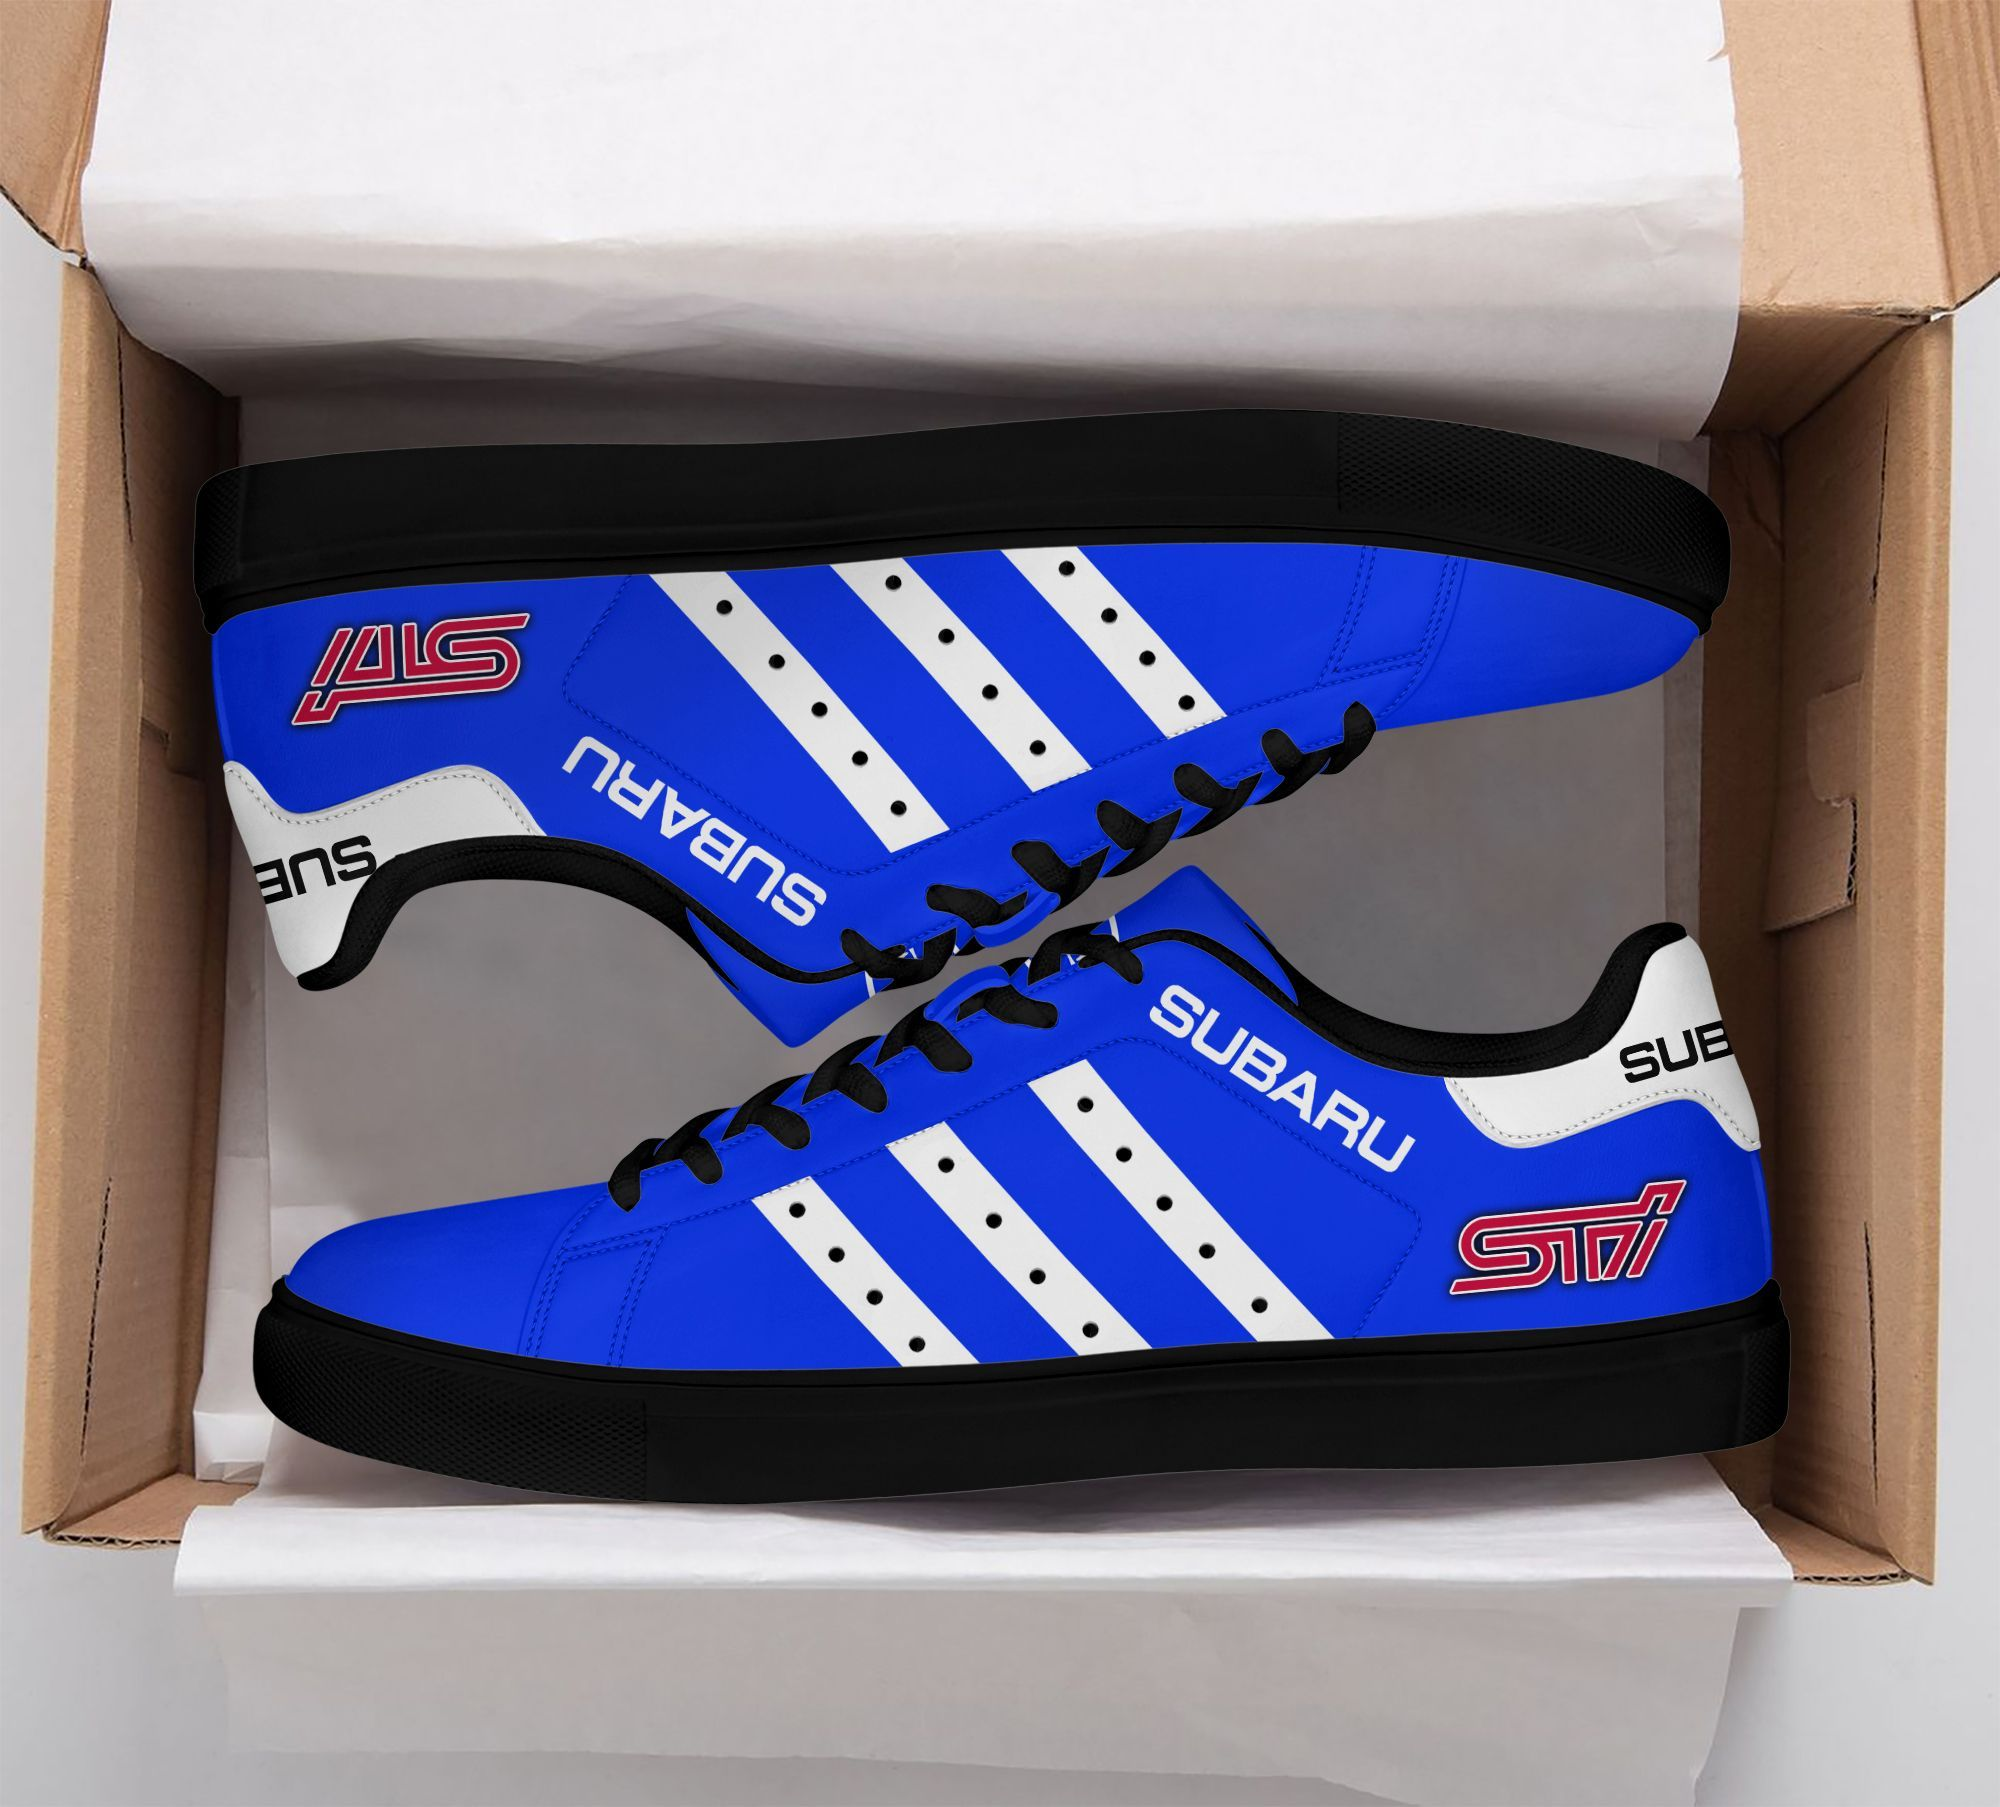 SUBARU STI Blue Stan Smith Shoes